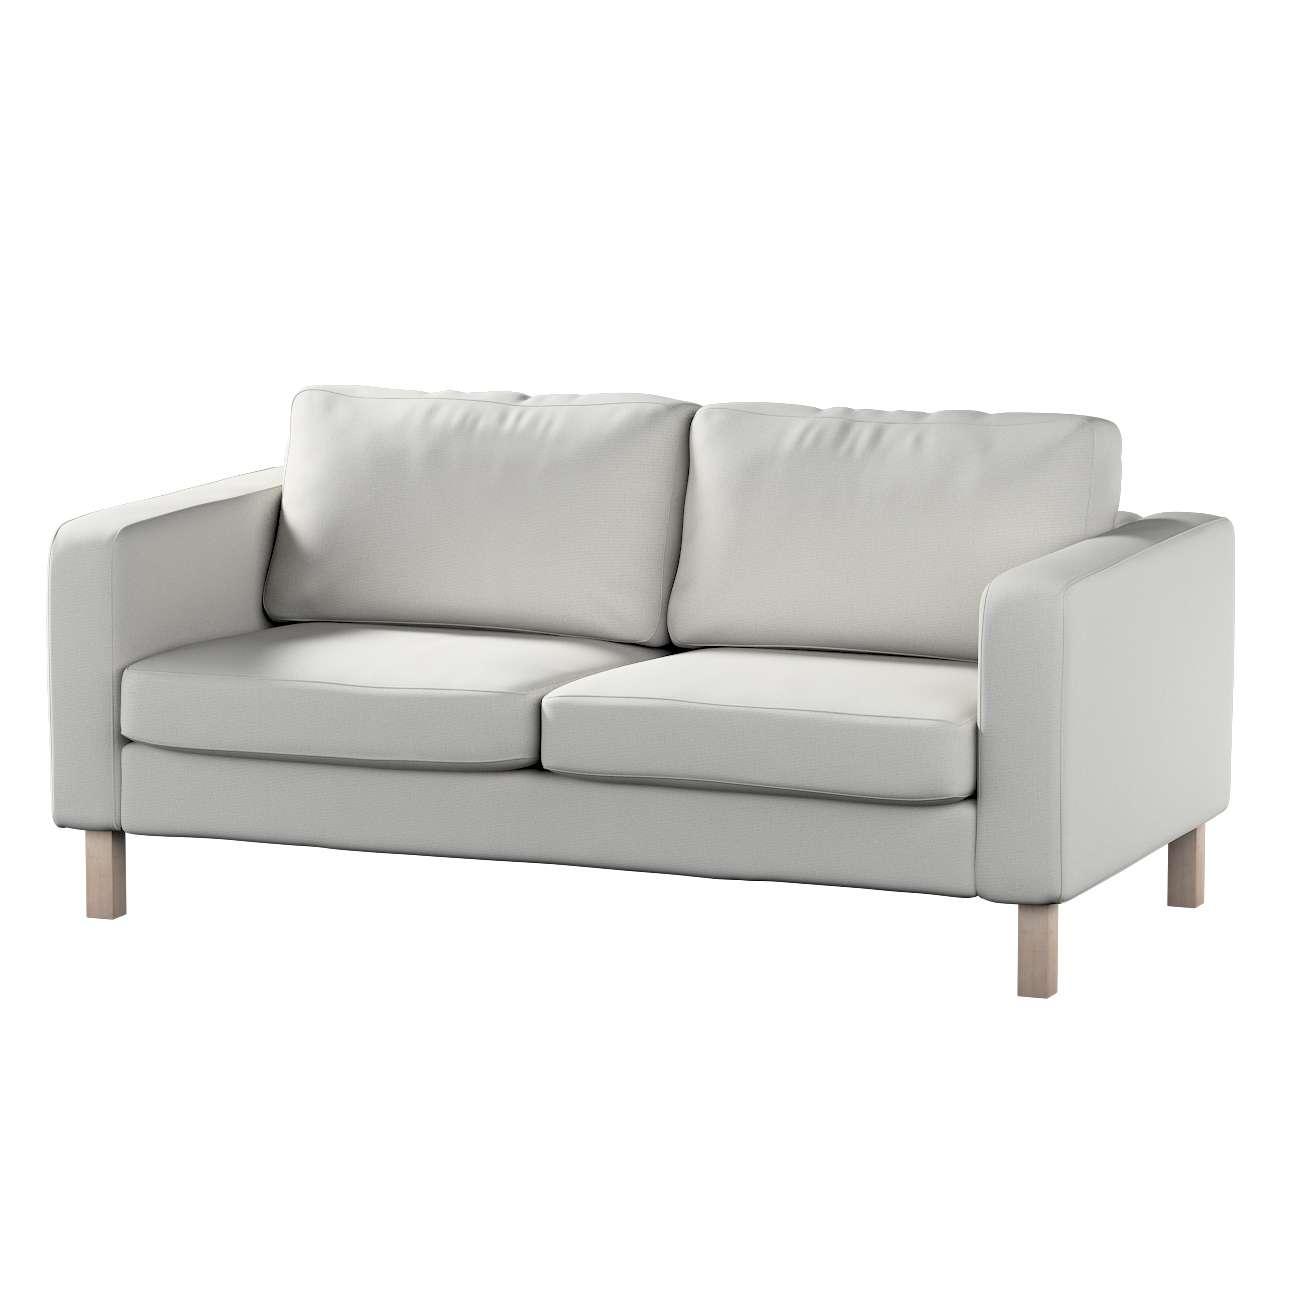 Karlstad 2 Seater Sofa Cover Dove Grey 705 90 165 X 89 X 64 Cm Dekoria